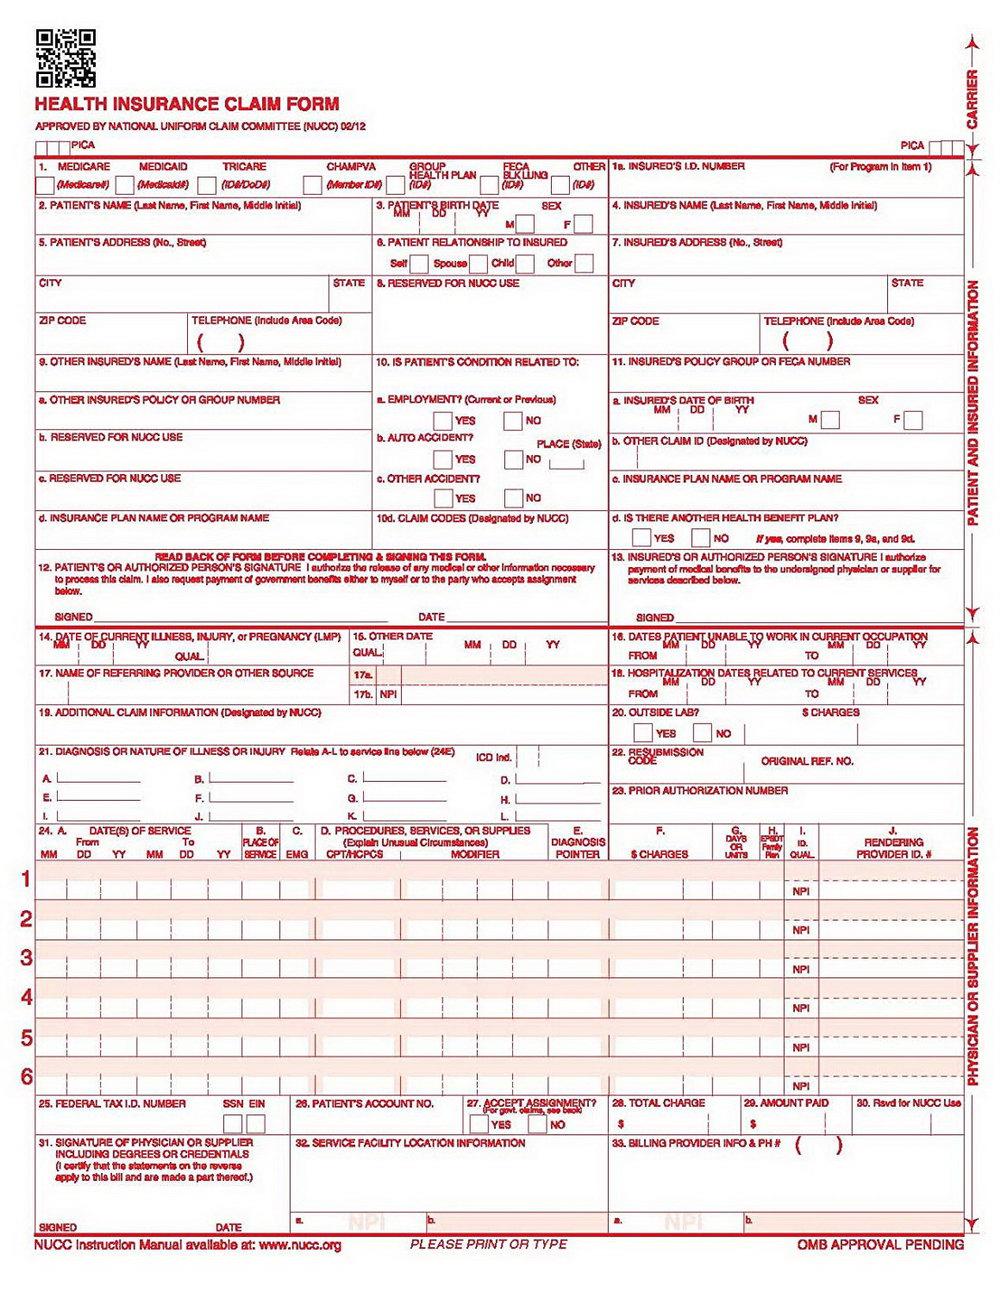 Cms 1500 Claim Form Pdf Free